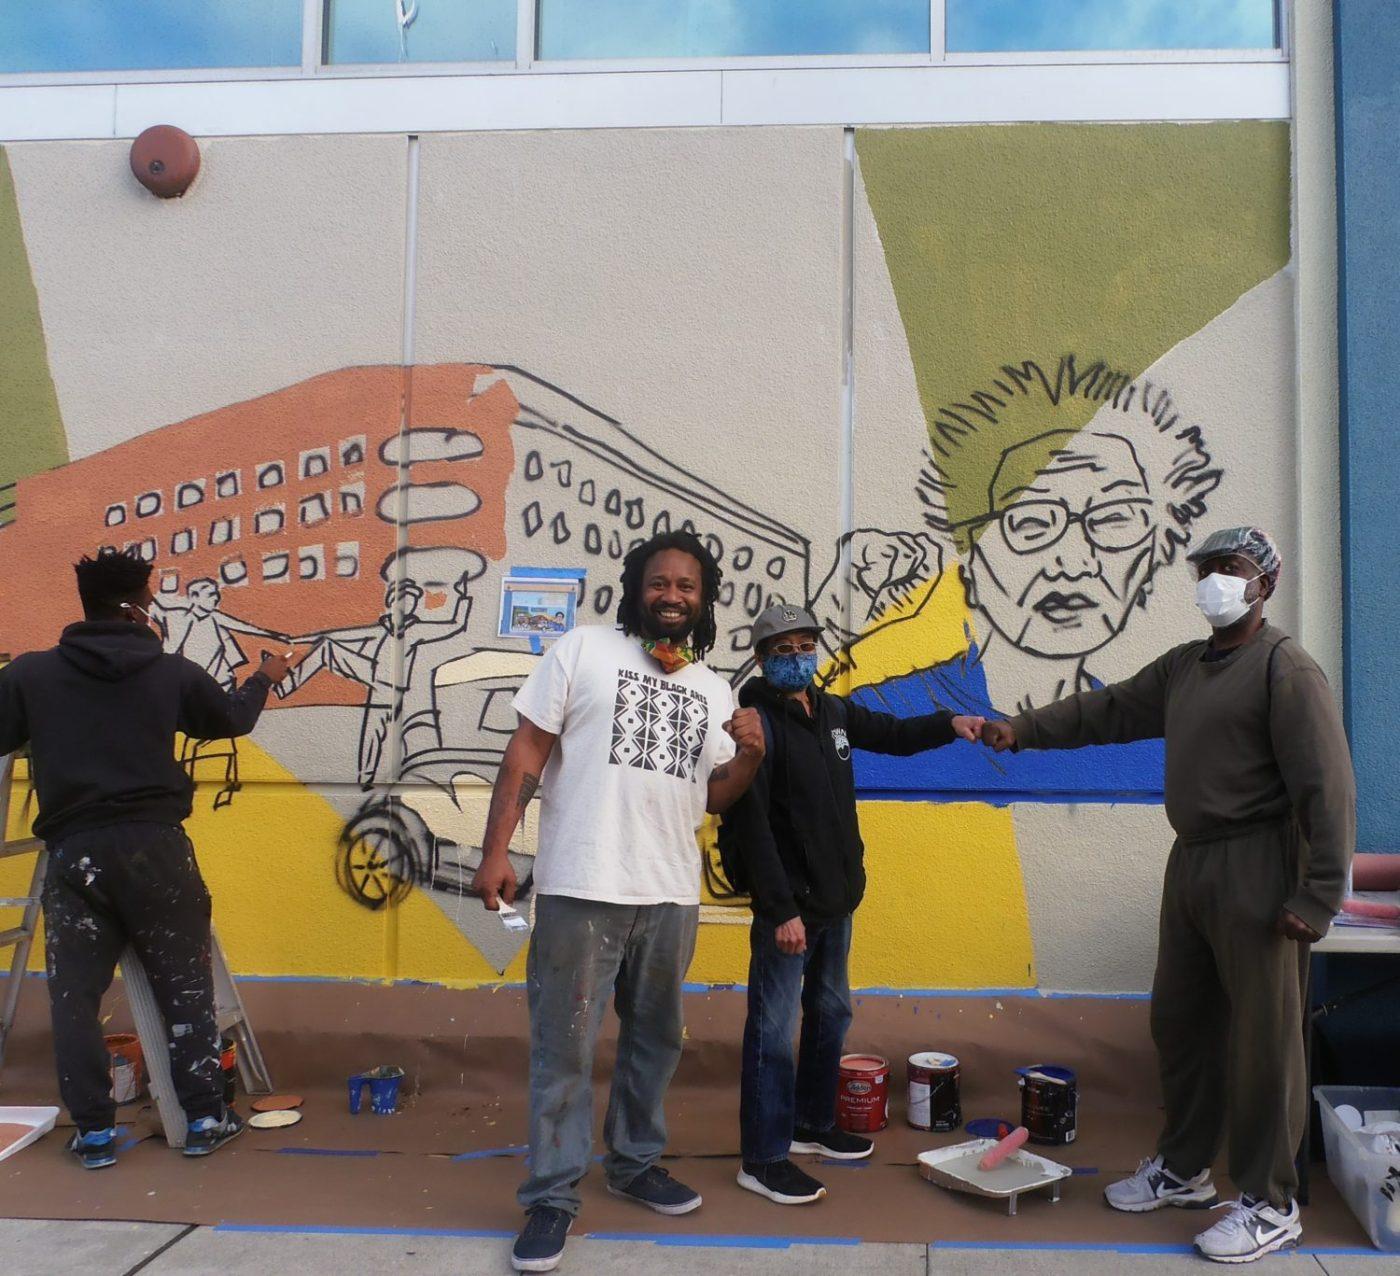 Brothers-Artistic-Eddie-Kochiyama-Jahahara-work-on-Mama-Yuri-Kochiyama-SPH-mural-1400x1276, Urgent appeal to President Trump, World News & Views